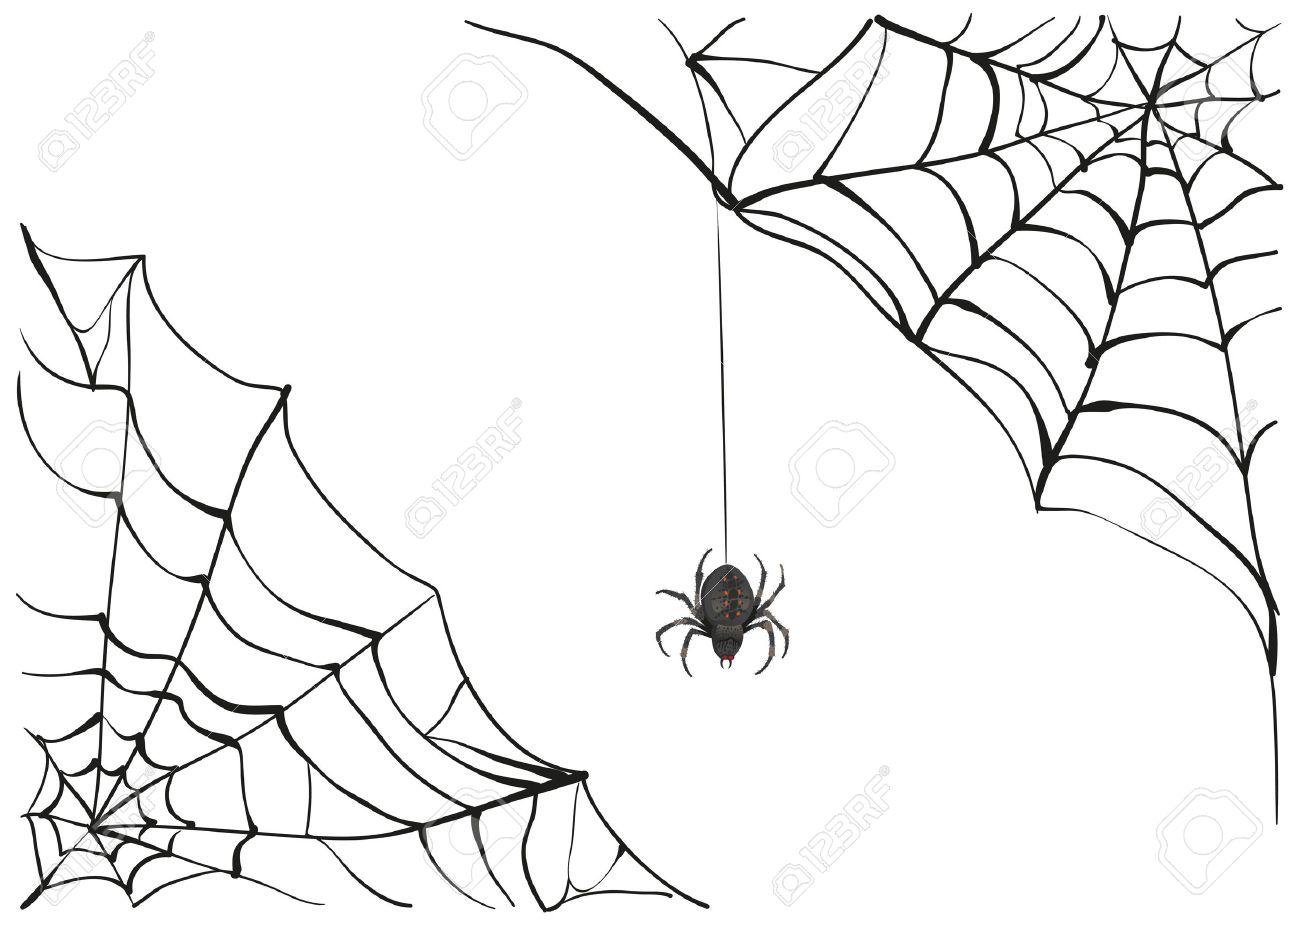 Spiderweb. Big black spider web. Black scary spider of web. Poison spider. Illustration in vector format - 46526612